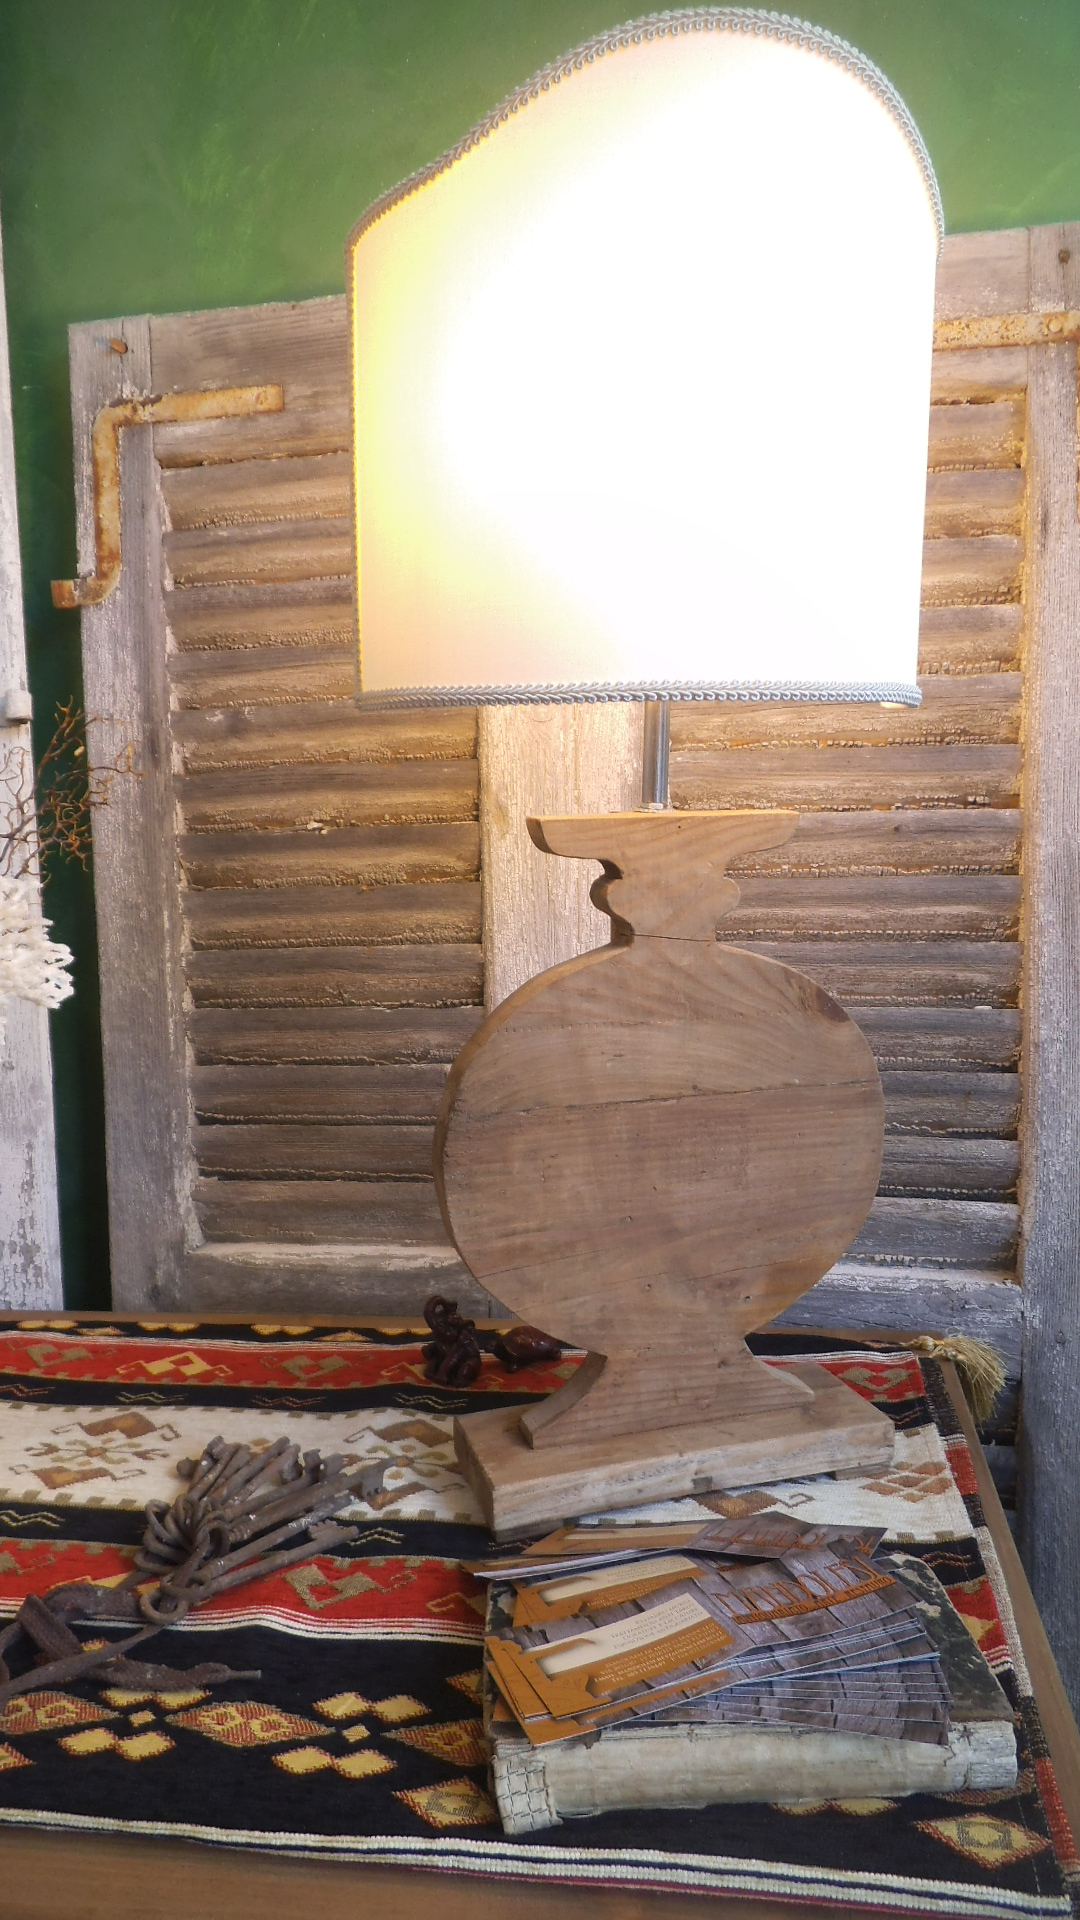 dscf4298 Mandolesi Restauro. L'artigianalità nel legno.